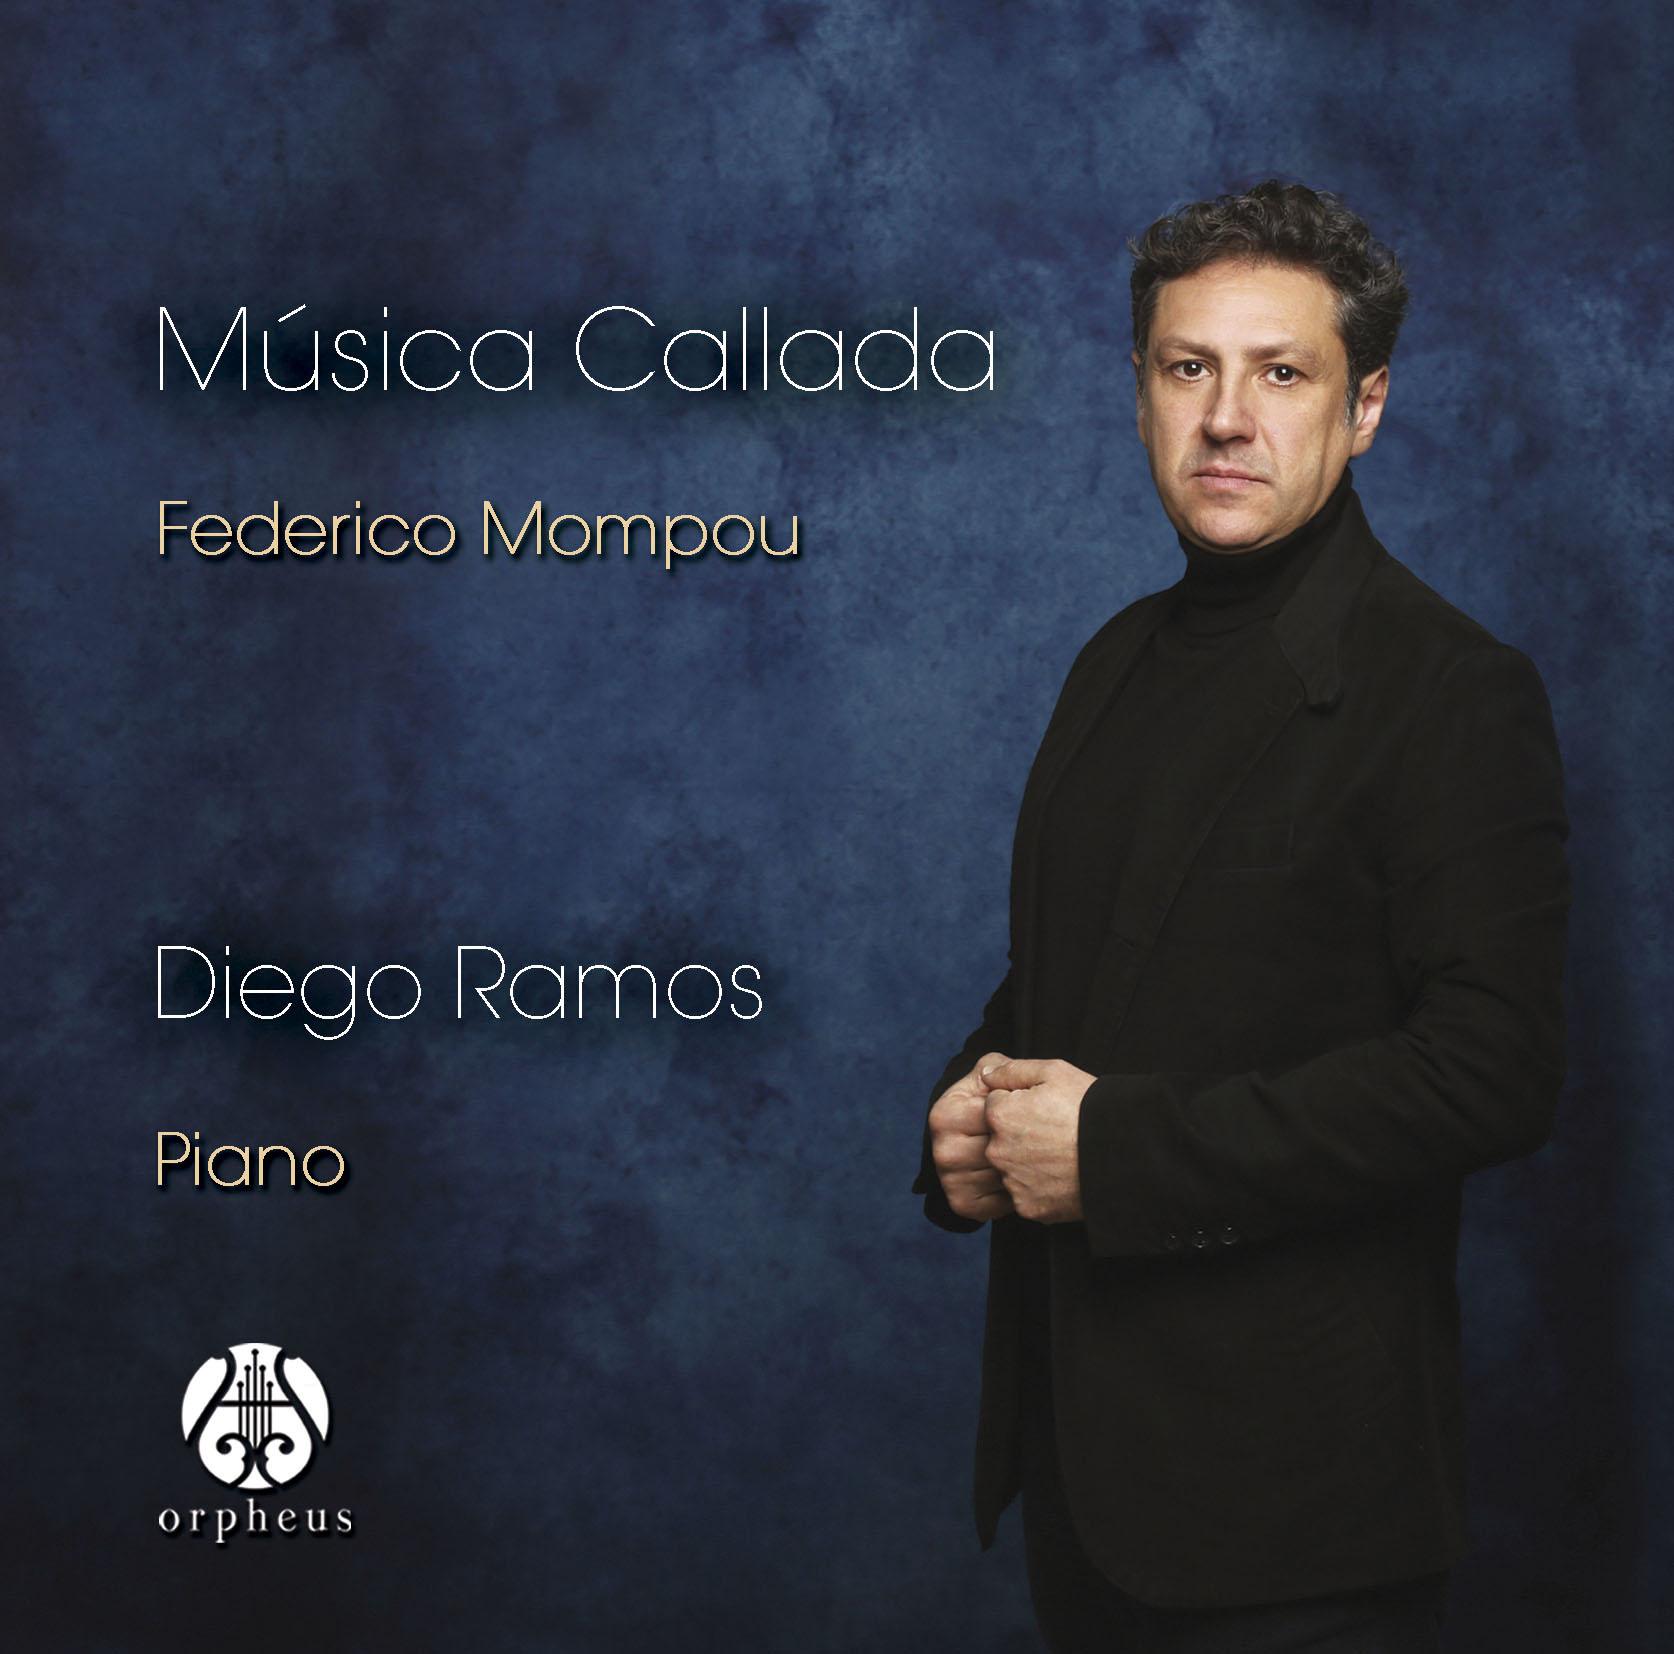 Diego Ramos portada